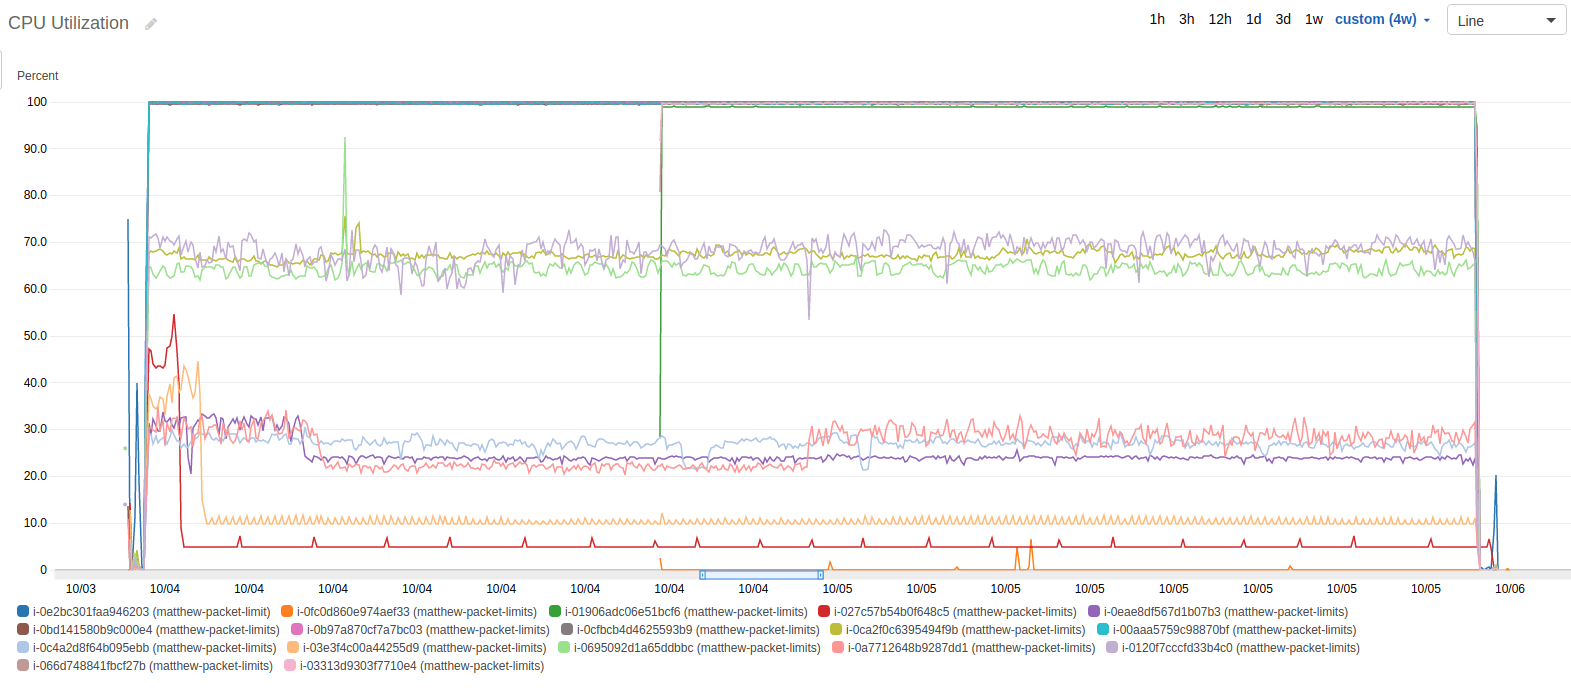 AWS Cloudwatch graph of CPU Utilization during test